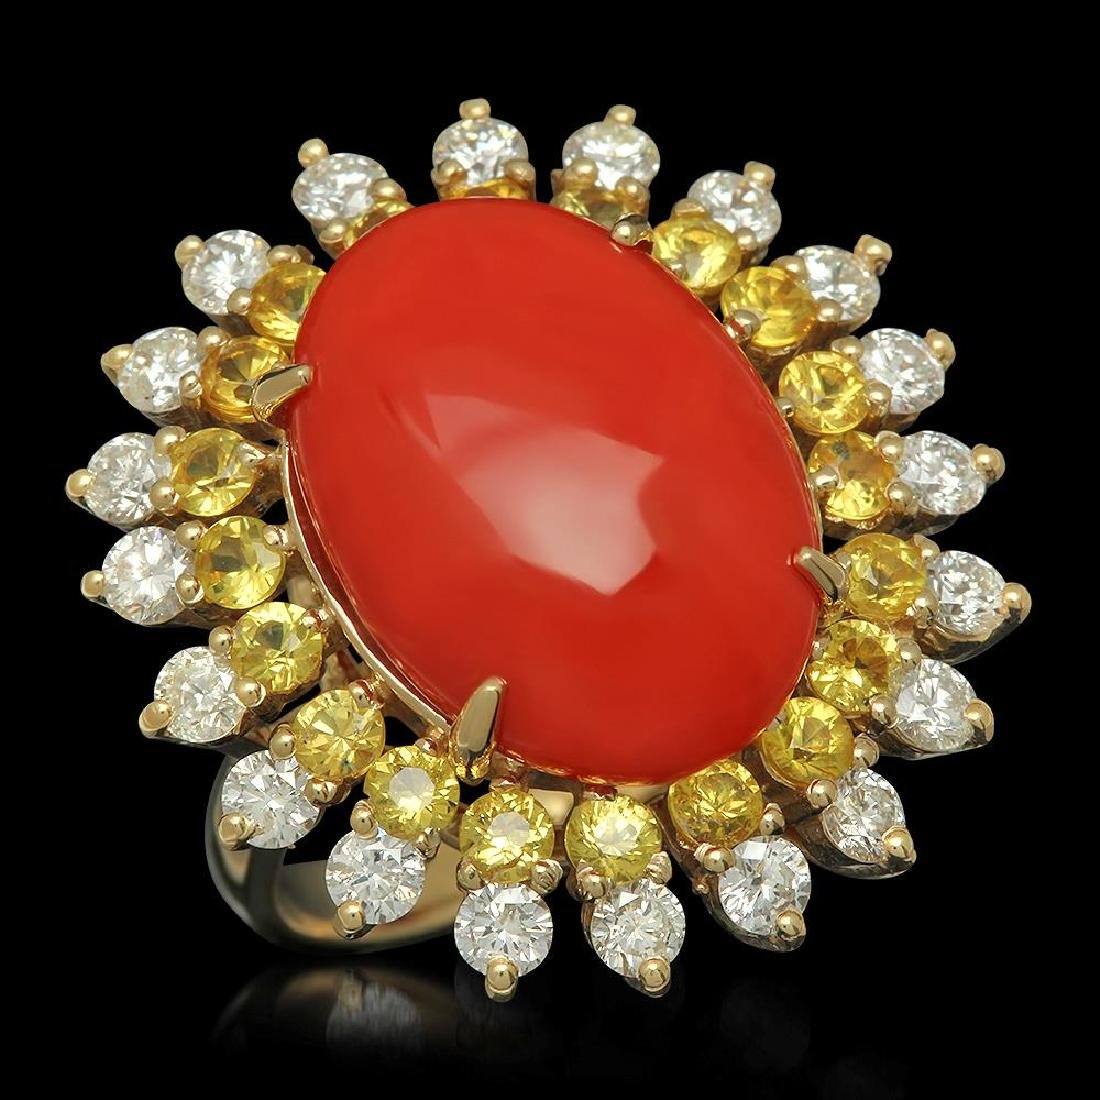 14K Gold 7.73ct Coral 1.82ct Sapphire 1.54ct Diamond